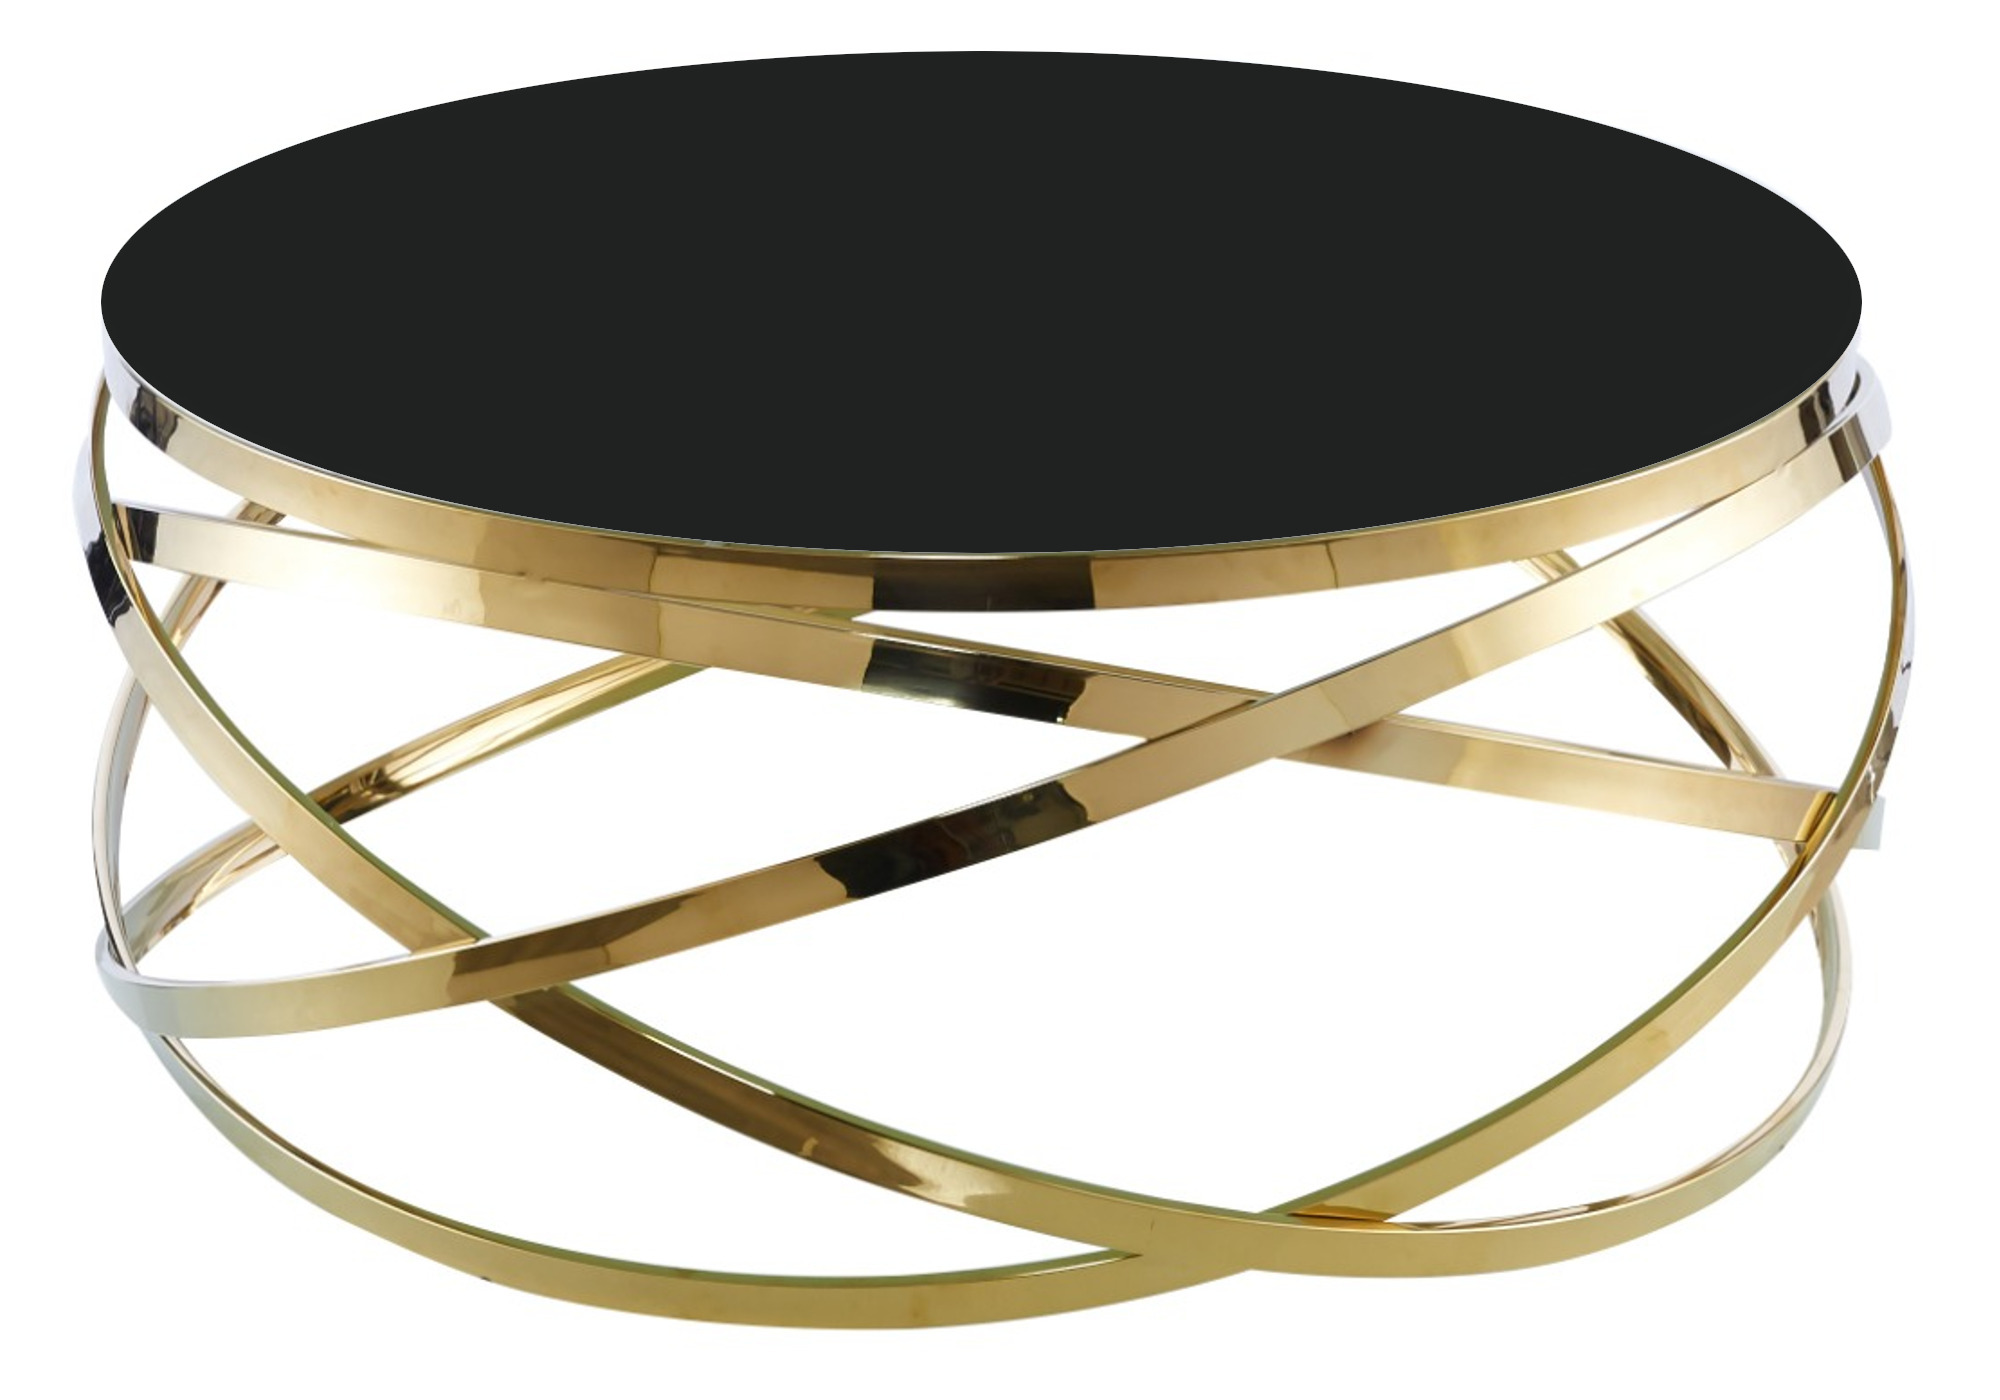 Table basse design doré noir EVO